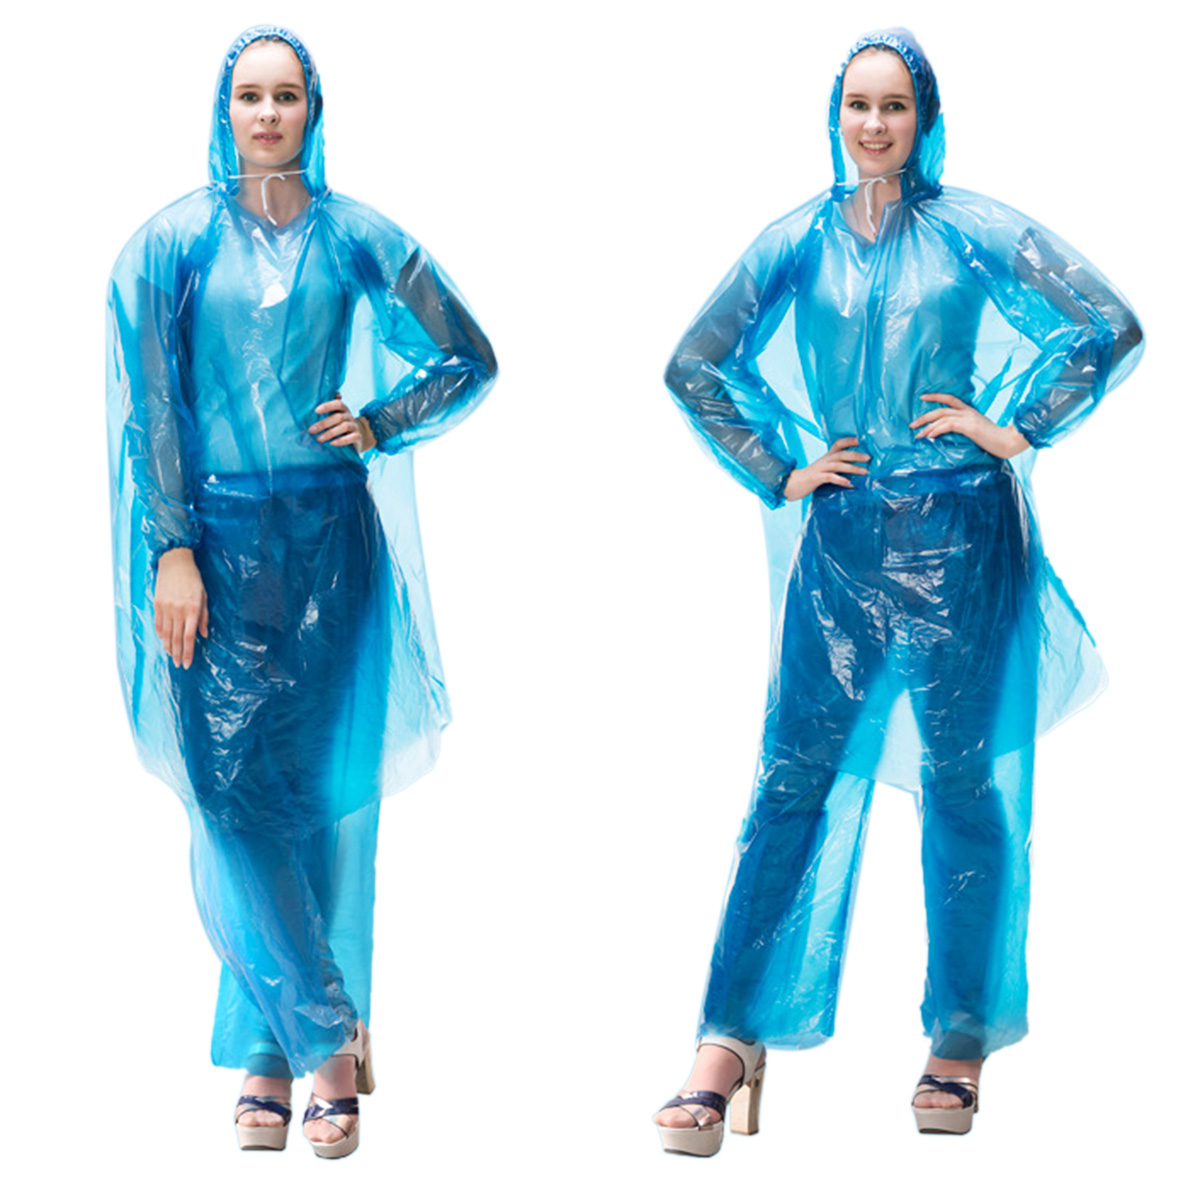 2020 Anti-Dust Daliy Reusable Coverall Protective Clothing Hazmat Suit Pants Split Type Raincover Drifting Hooded Raincoats Sets